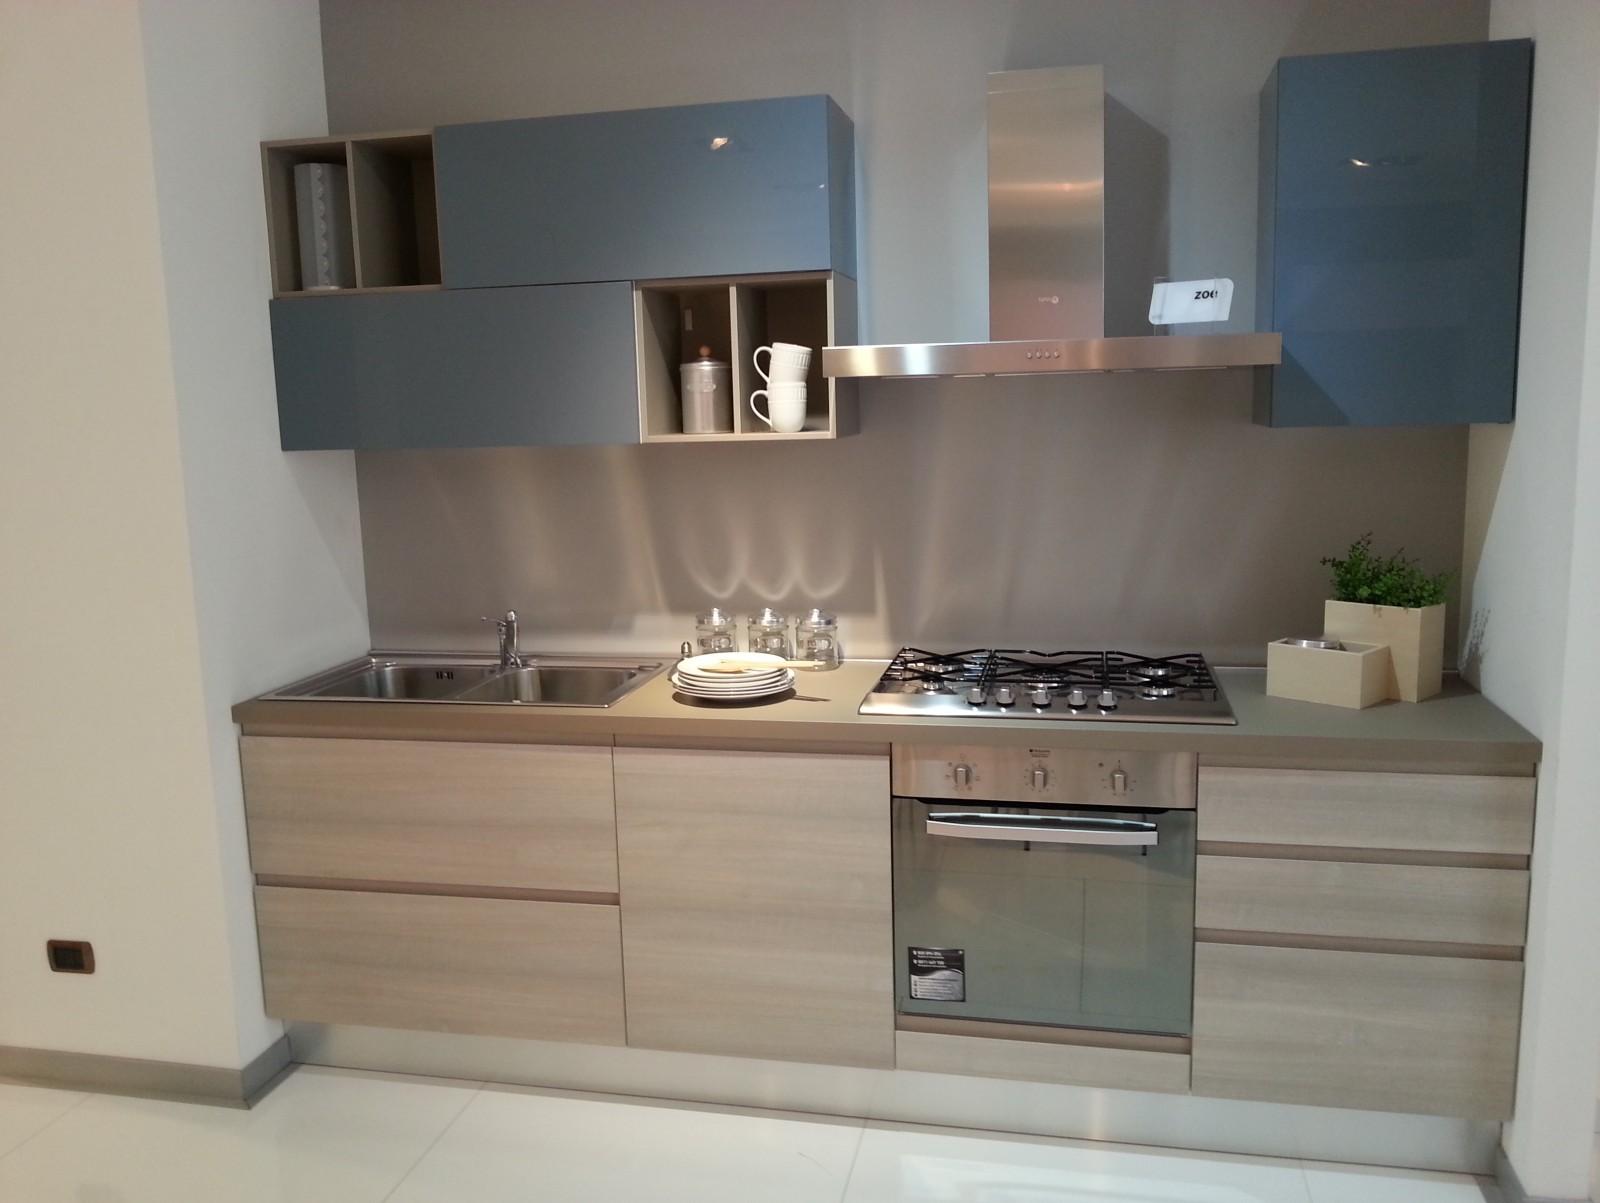 Proposte d 39 arredo cucine cucina promo di creo kitchens - Cucine lube creo ...